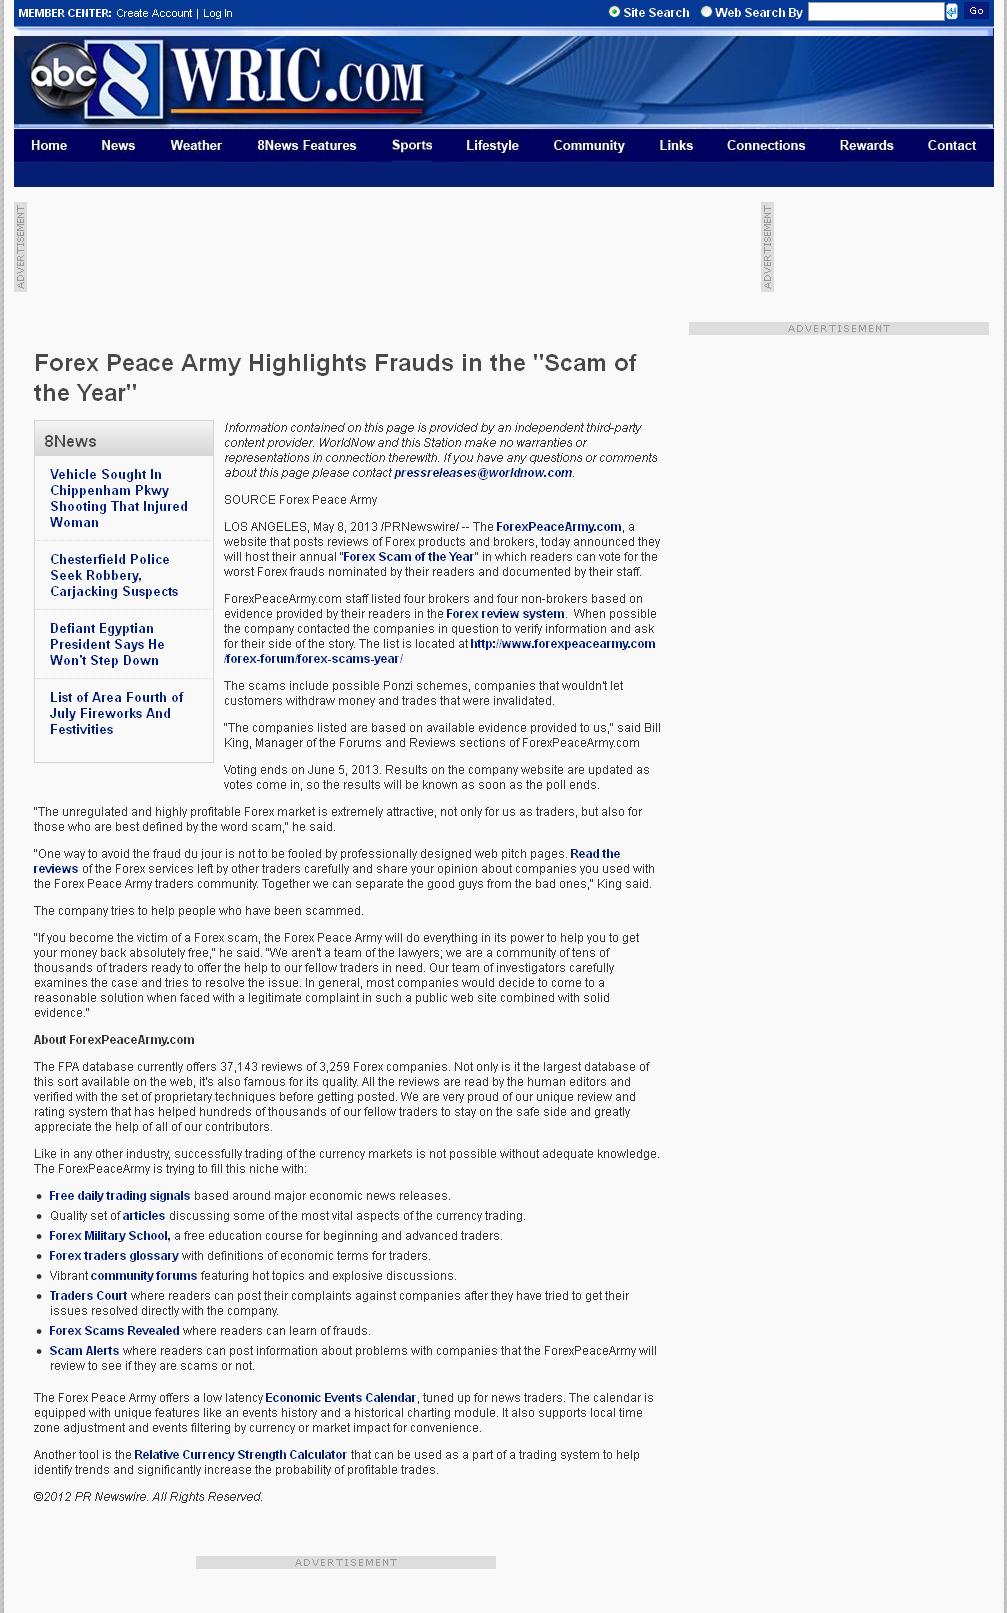 Forex Peace Army | WRIC ABC-8 (Richmond, VA)